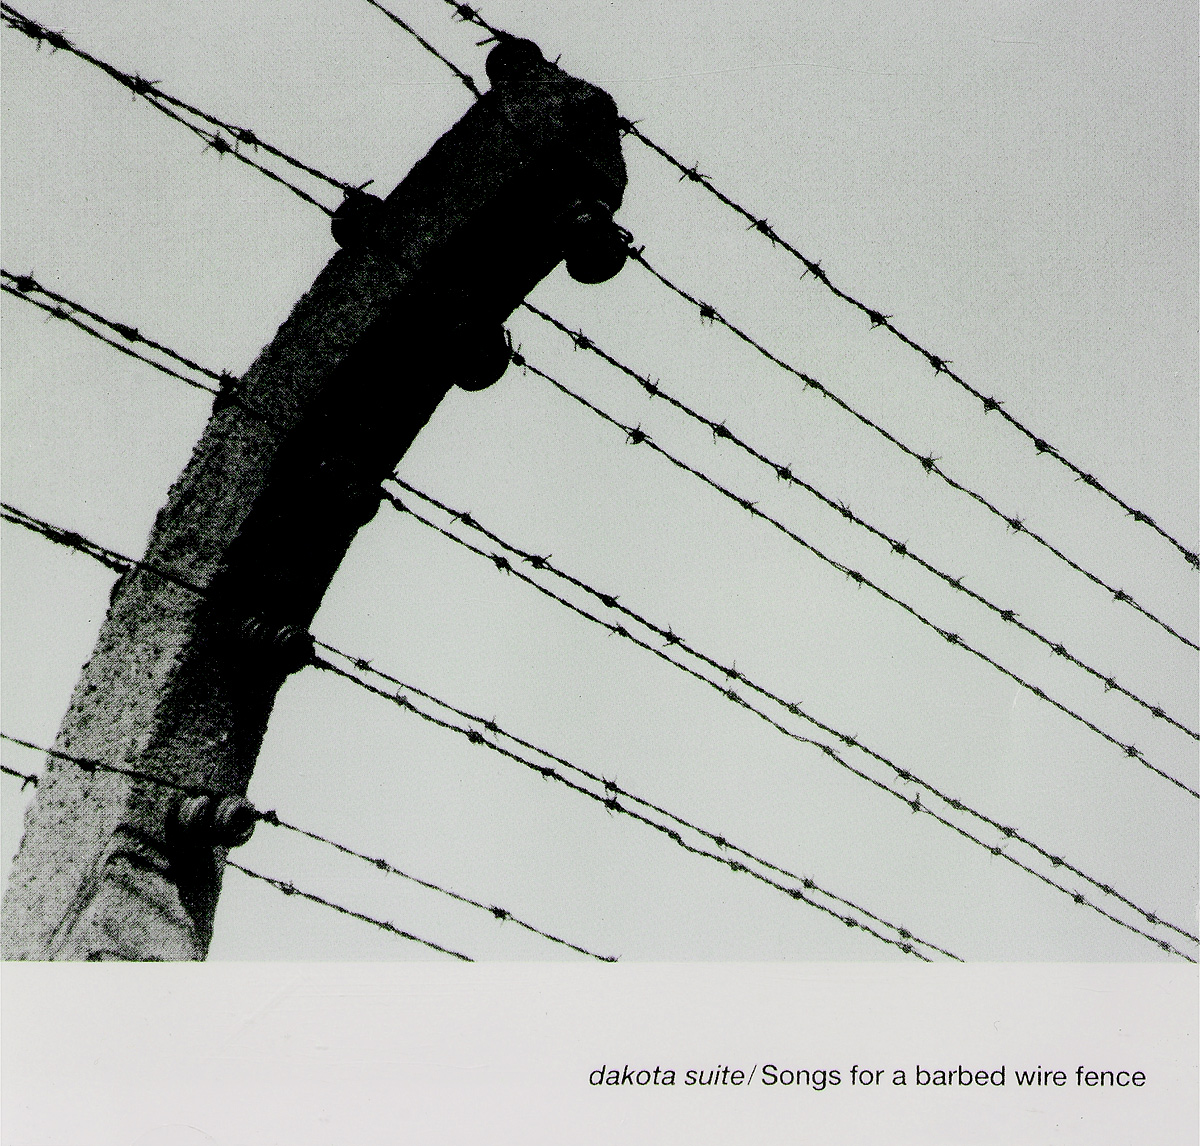 Dakota Suite Dakota Suite. Songs For A Barbed Wire Fence dakota